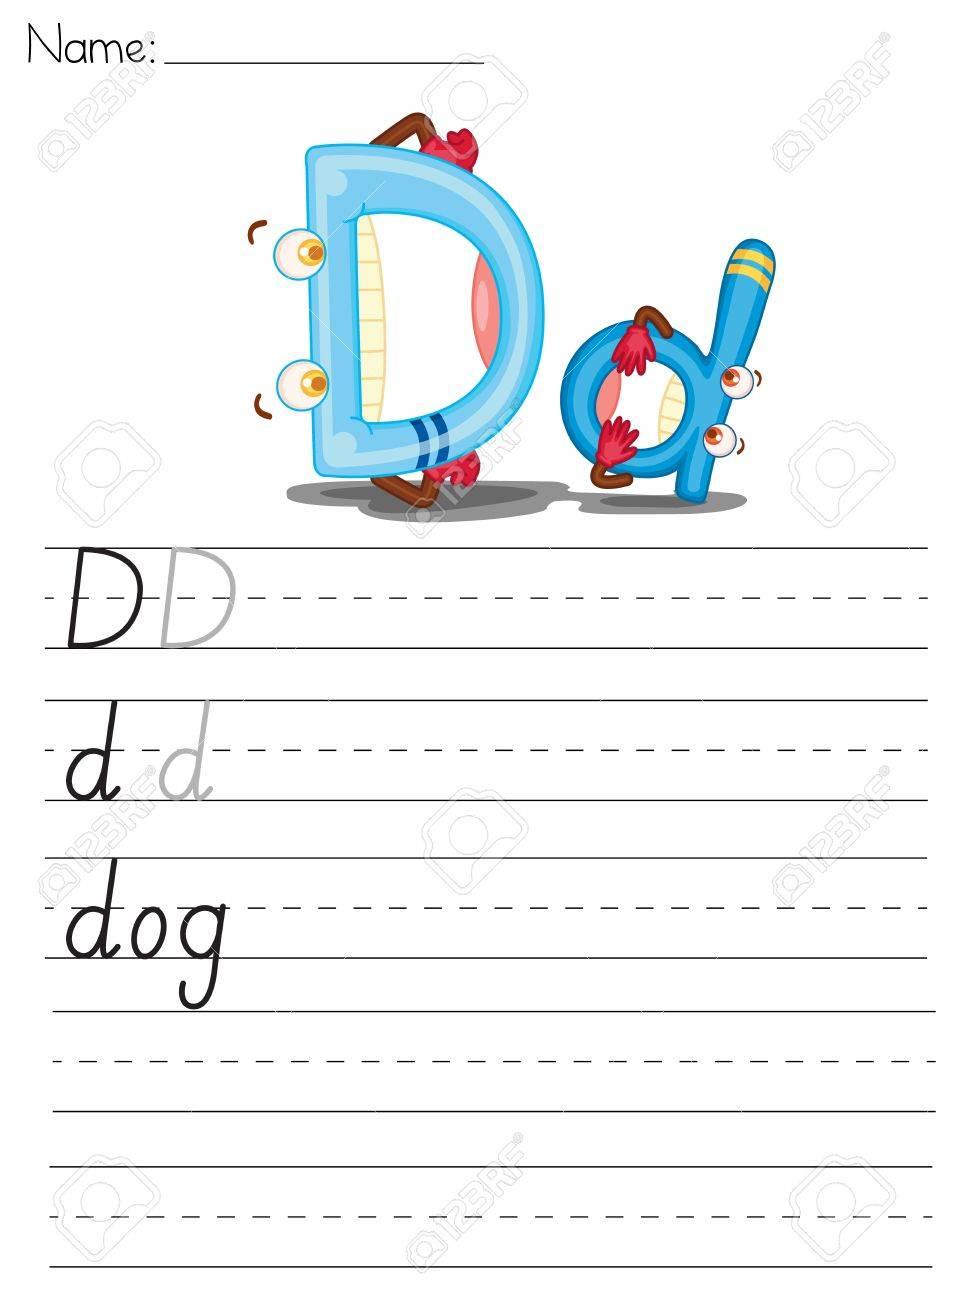 Illustrated alphabet worksheet of the letter d Stock Vector - 13892267